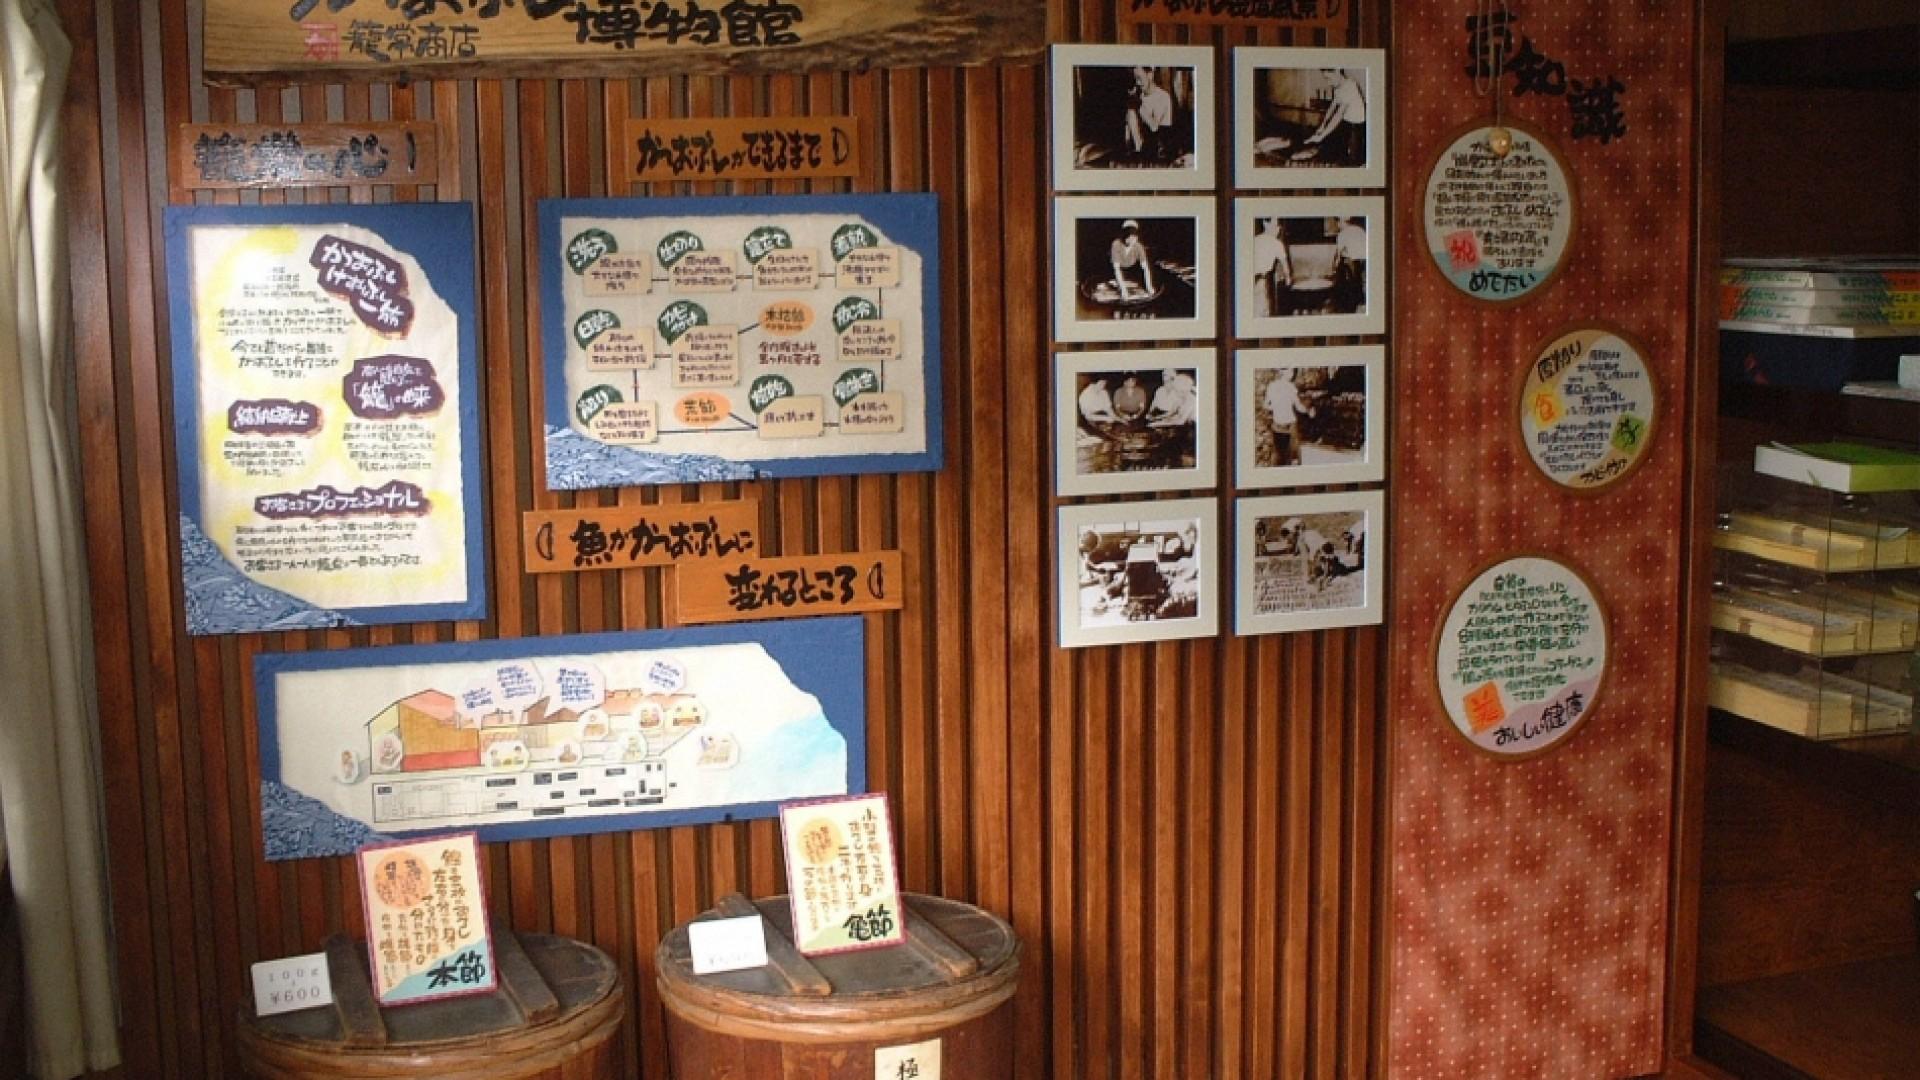 Bảo tàng Katsuobushi, Kagotune